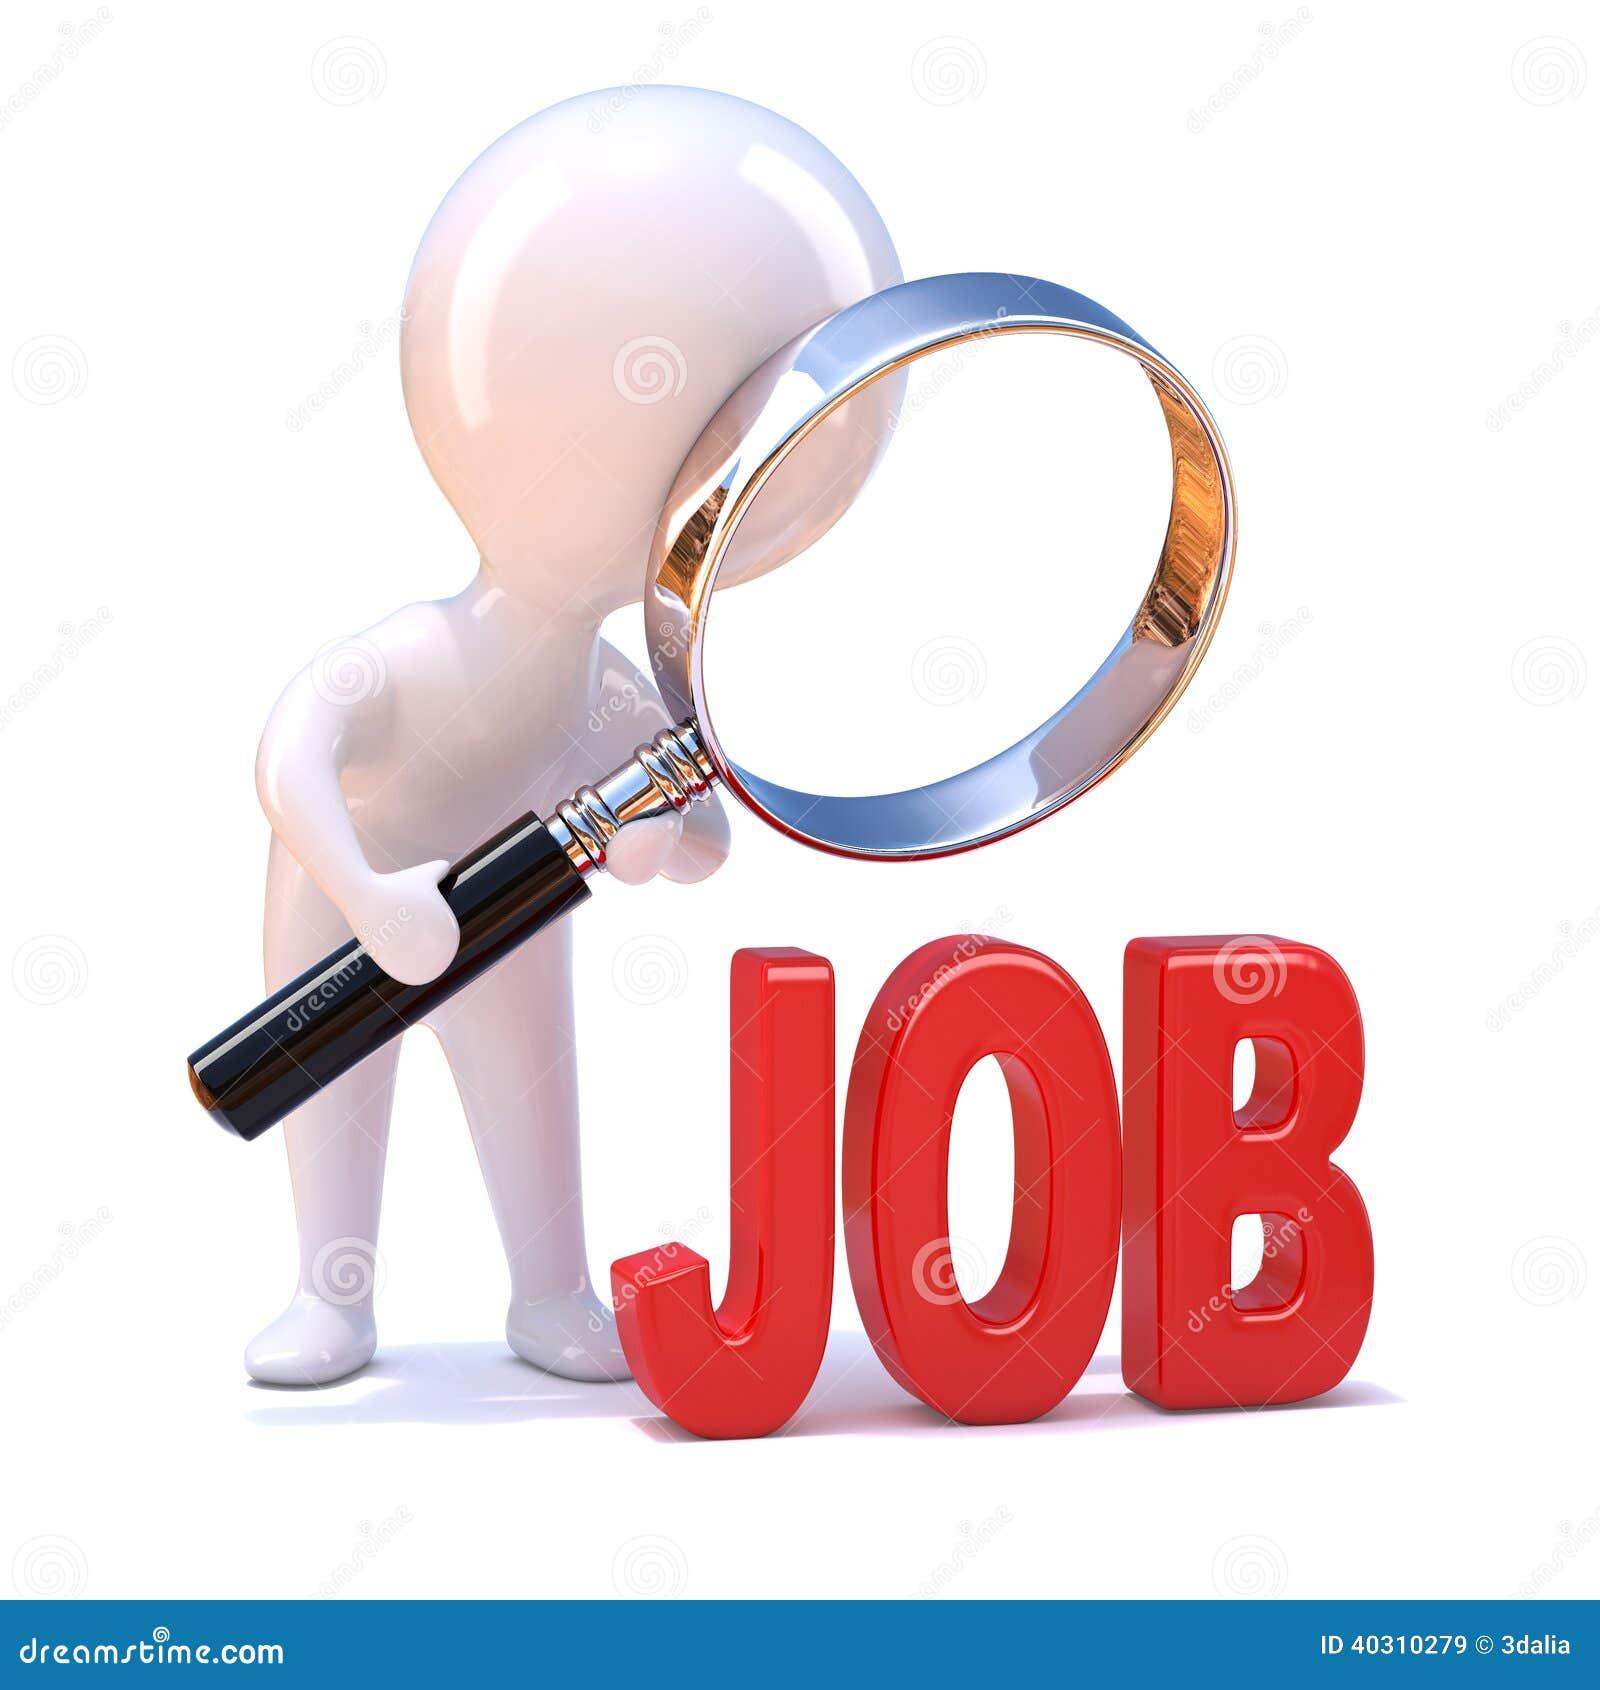 7 Up Job Vacancy